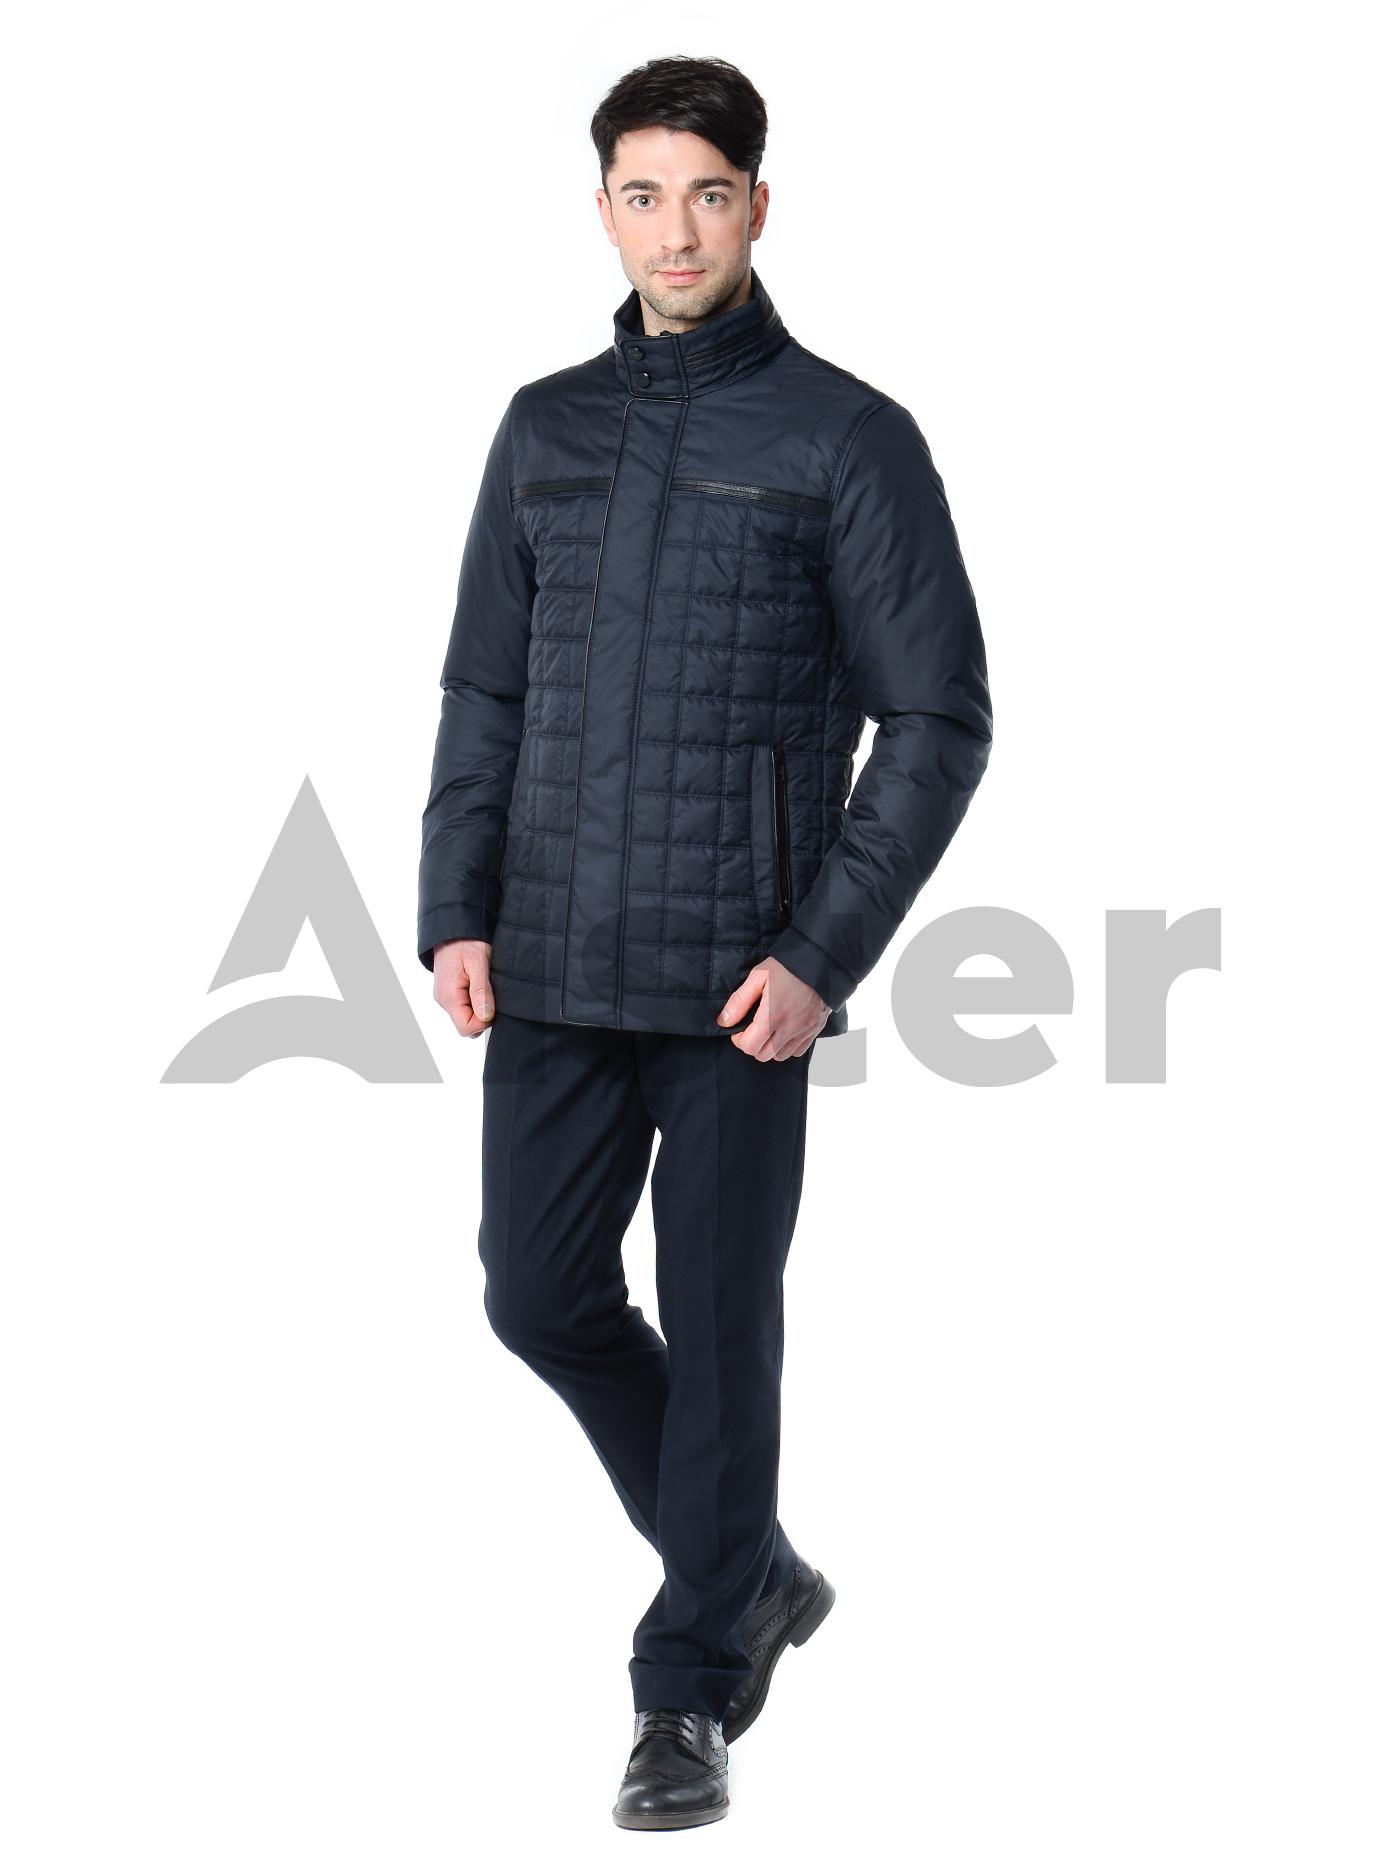 Куртка мужская демисезонная стёганая Тёмно-синий 46 (02-MT19090): фото - Alster.ua